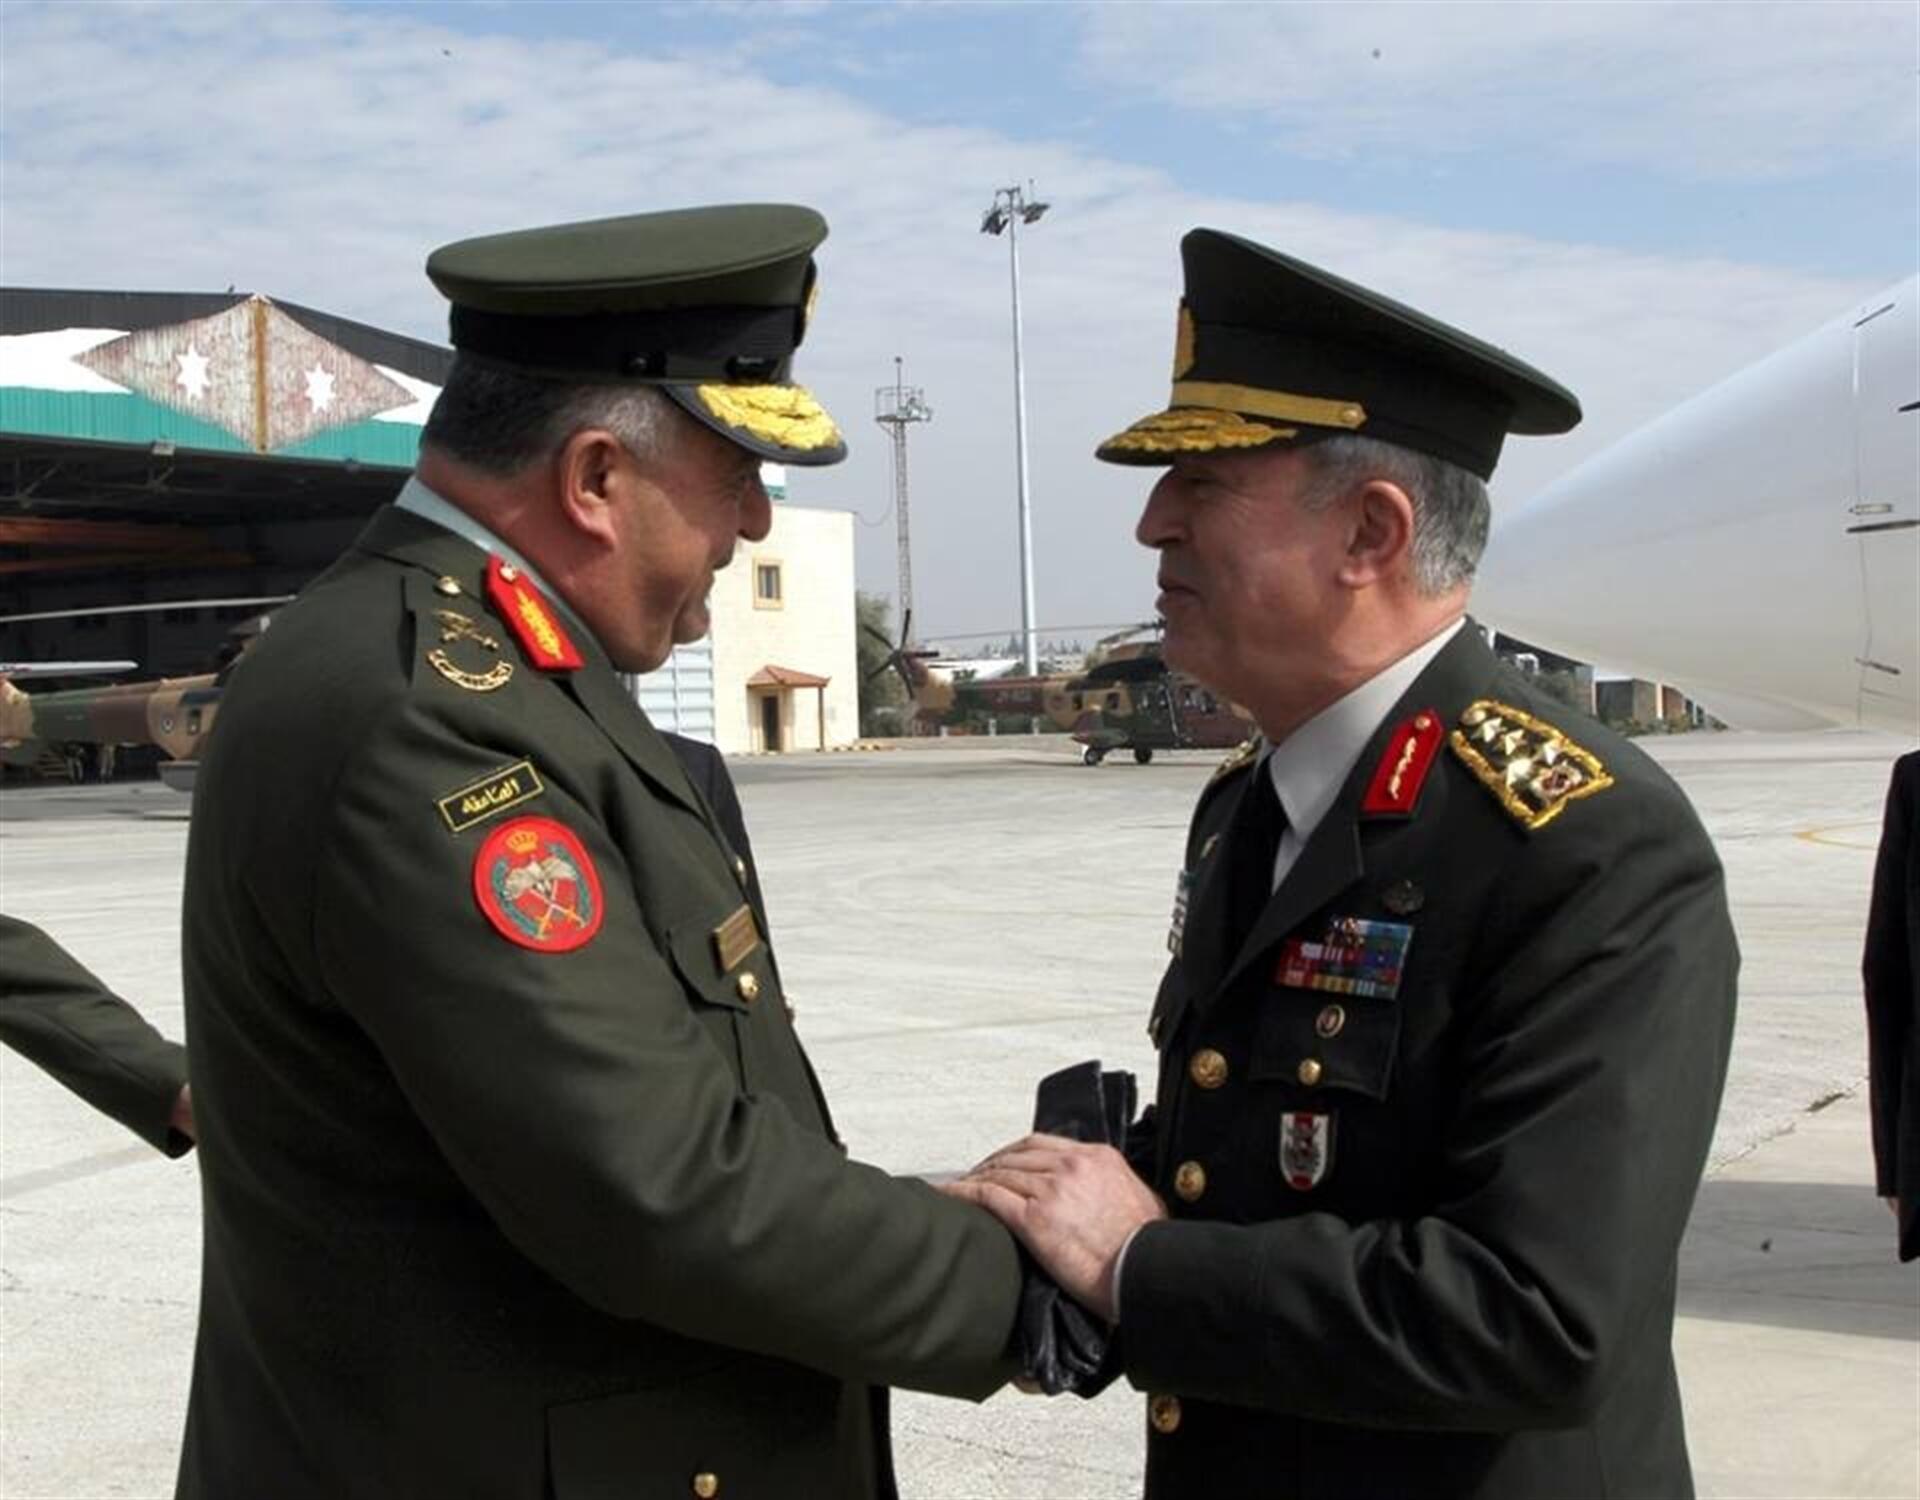 Turkey, Jordan ink military cooperation deal - Turkey News